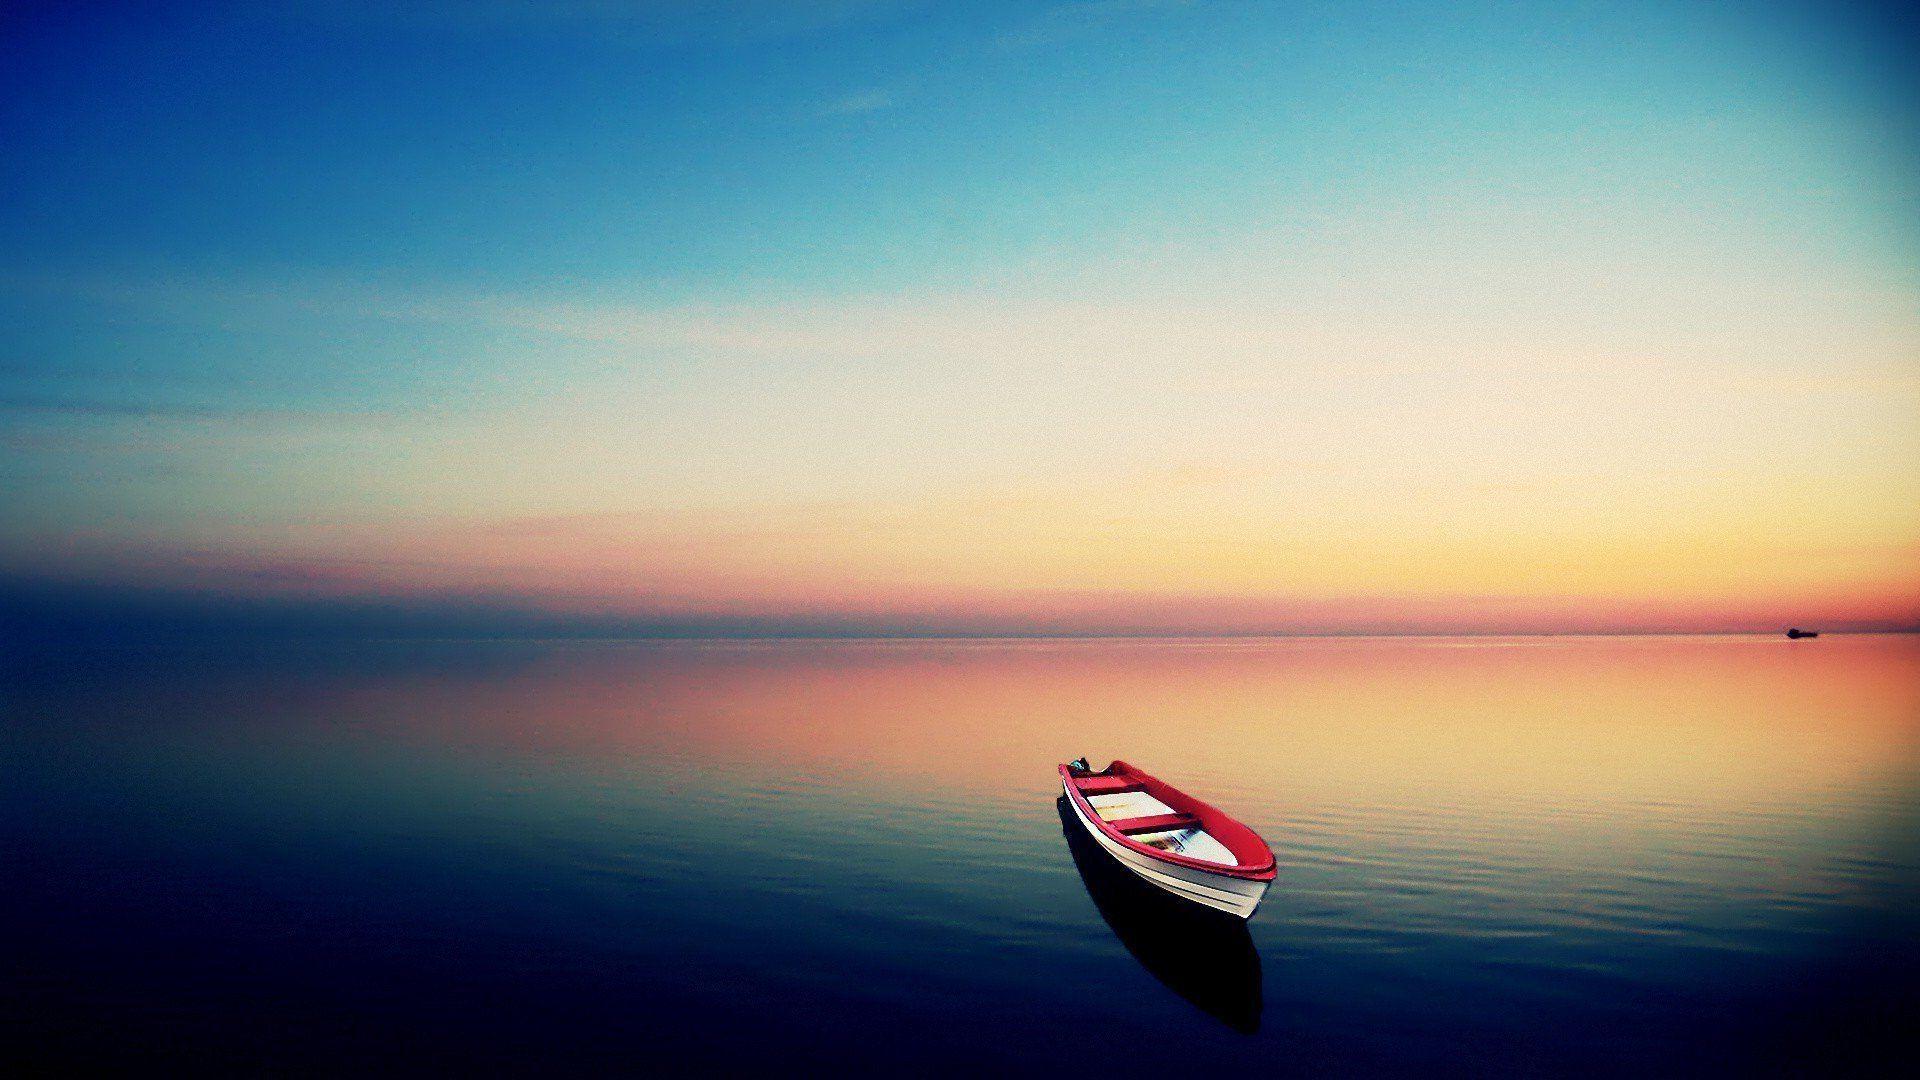 Empty Boat Under The Dusk Sky Wallpaper - WallDevil